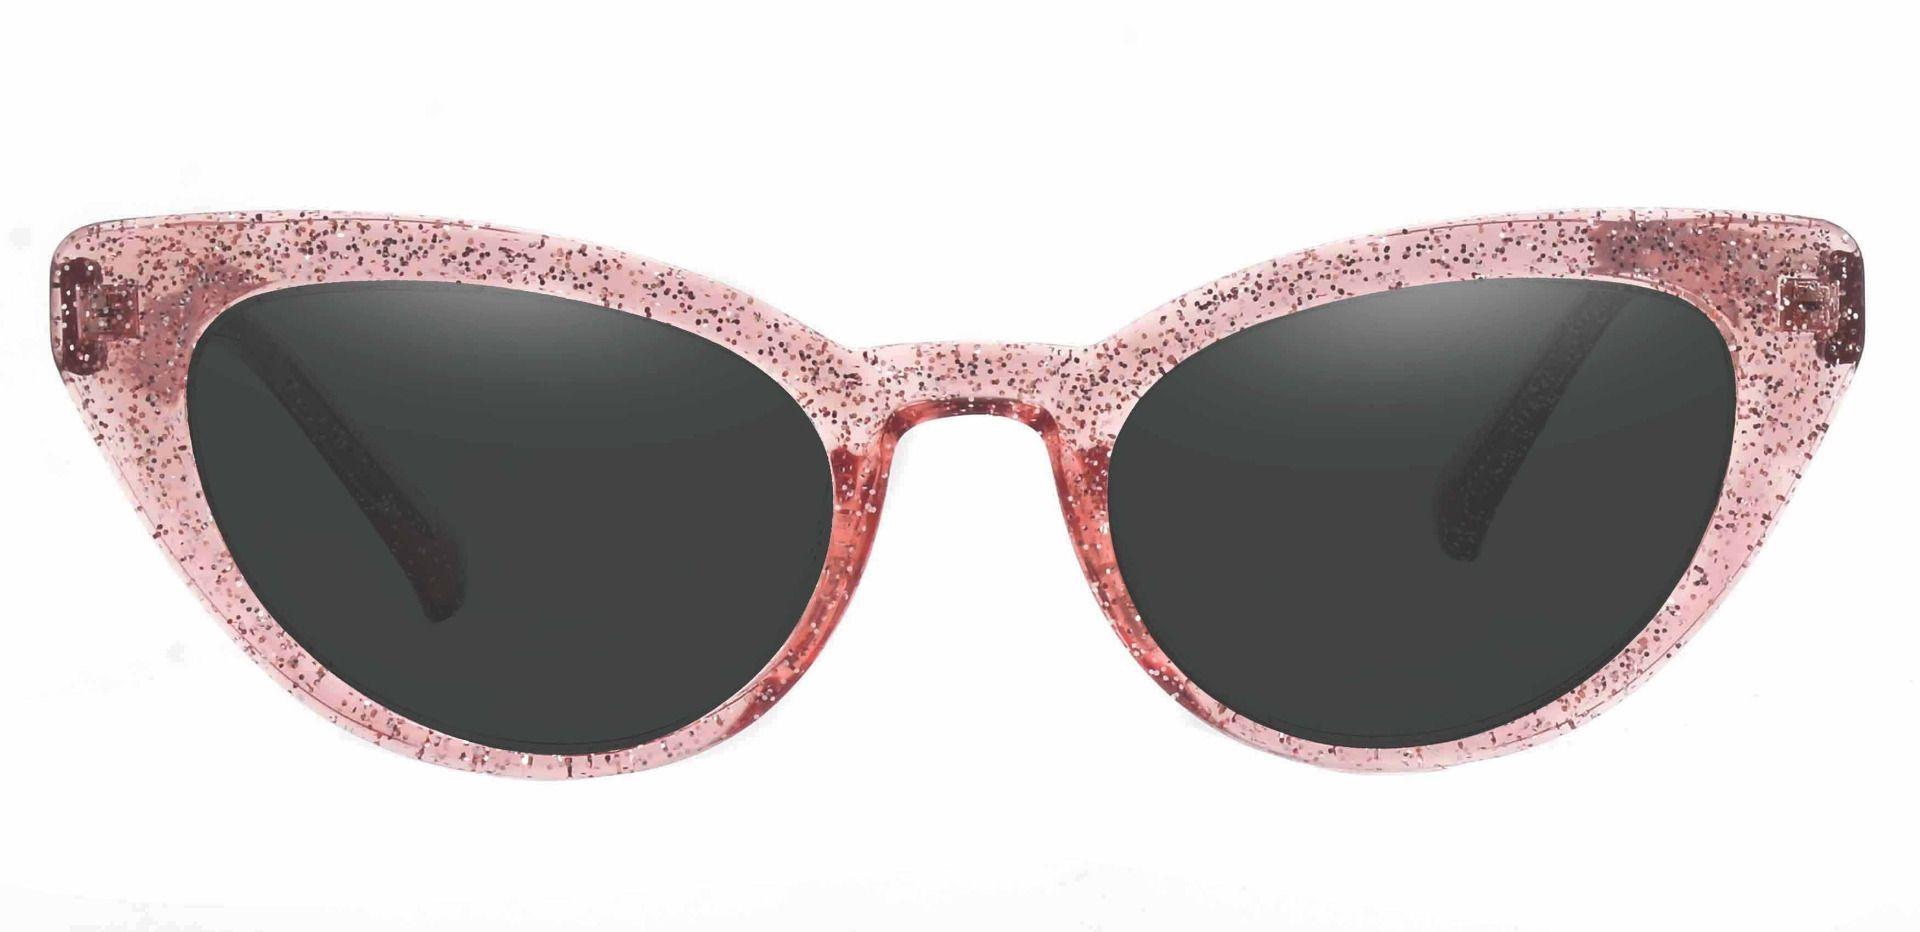 June Cat Eye Reading Sunglasses - Pink Frame With Gray Lenses